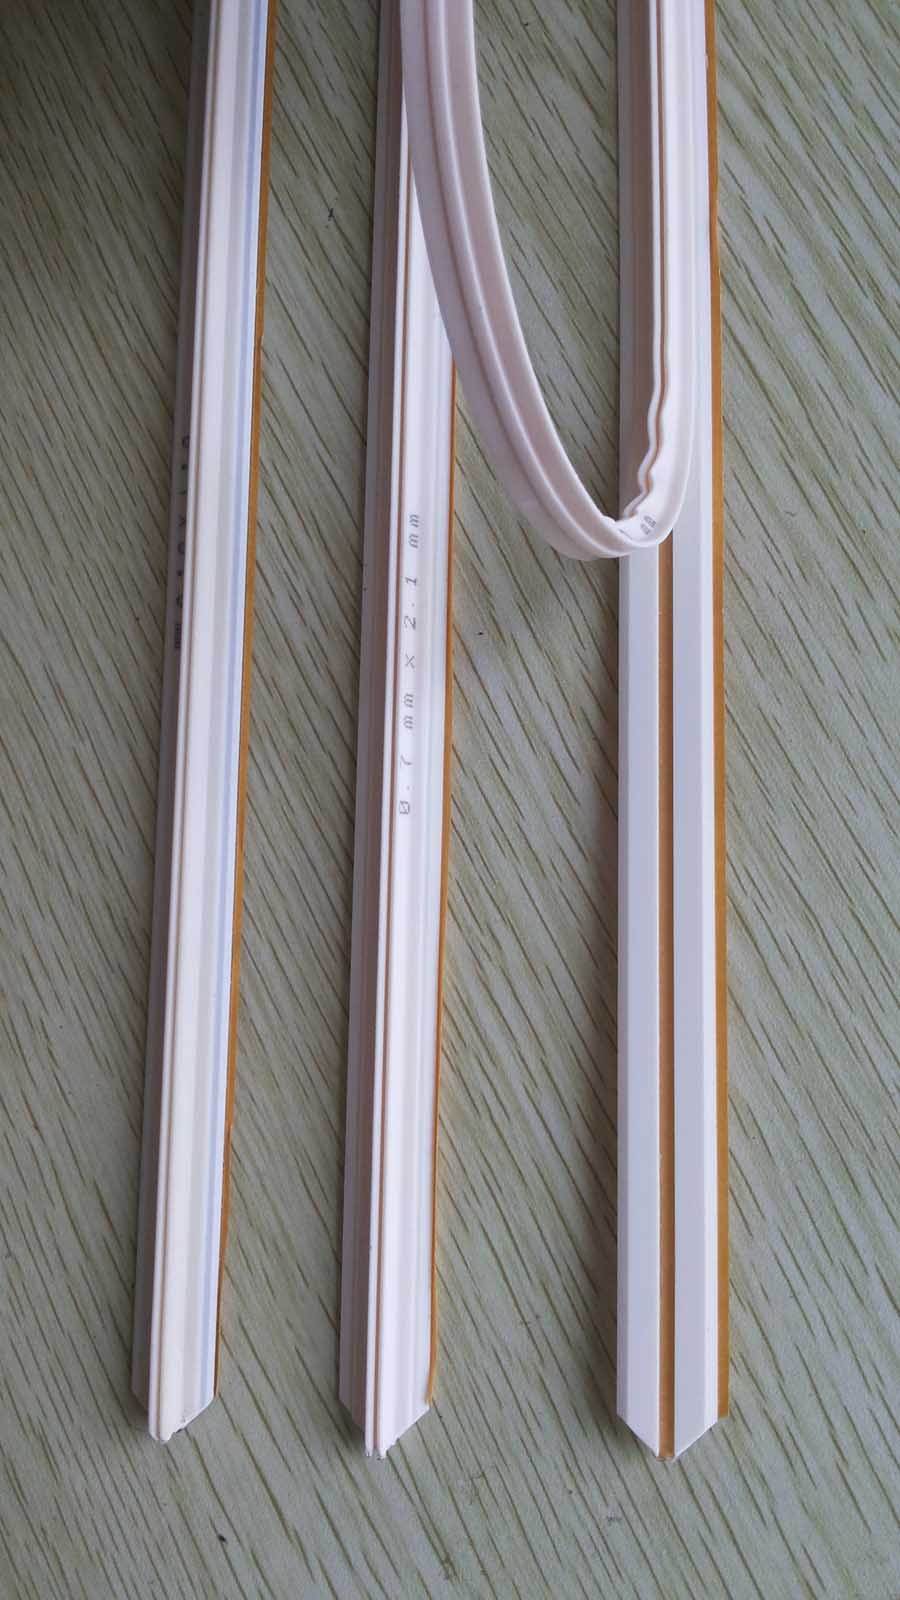 PVC压痕模出售-青岛高性价压痕条批售